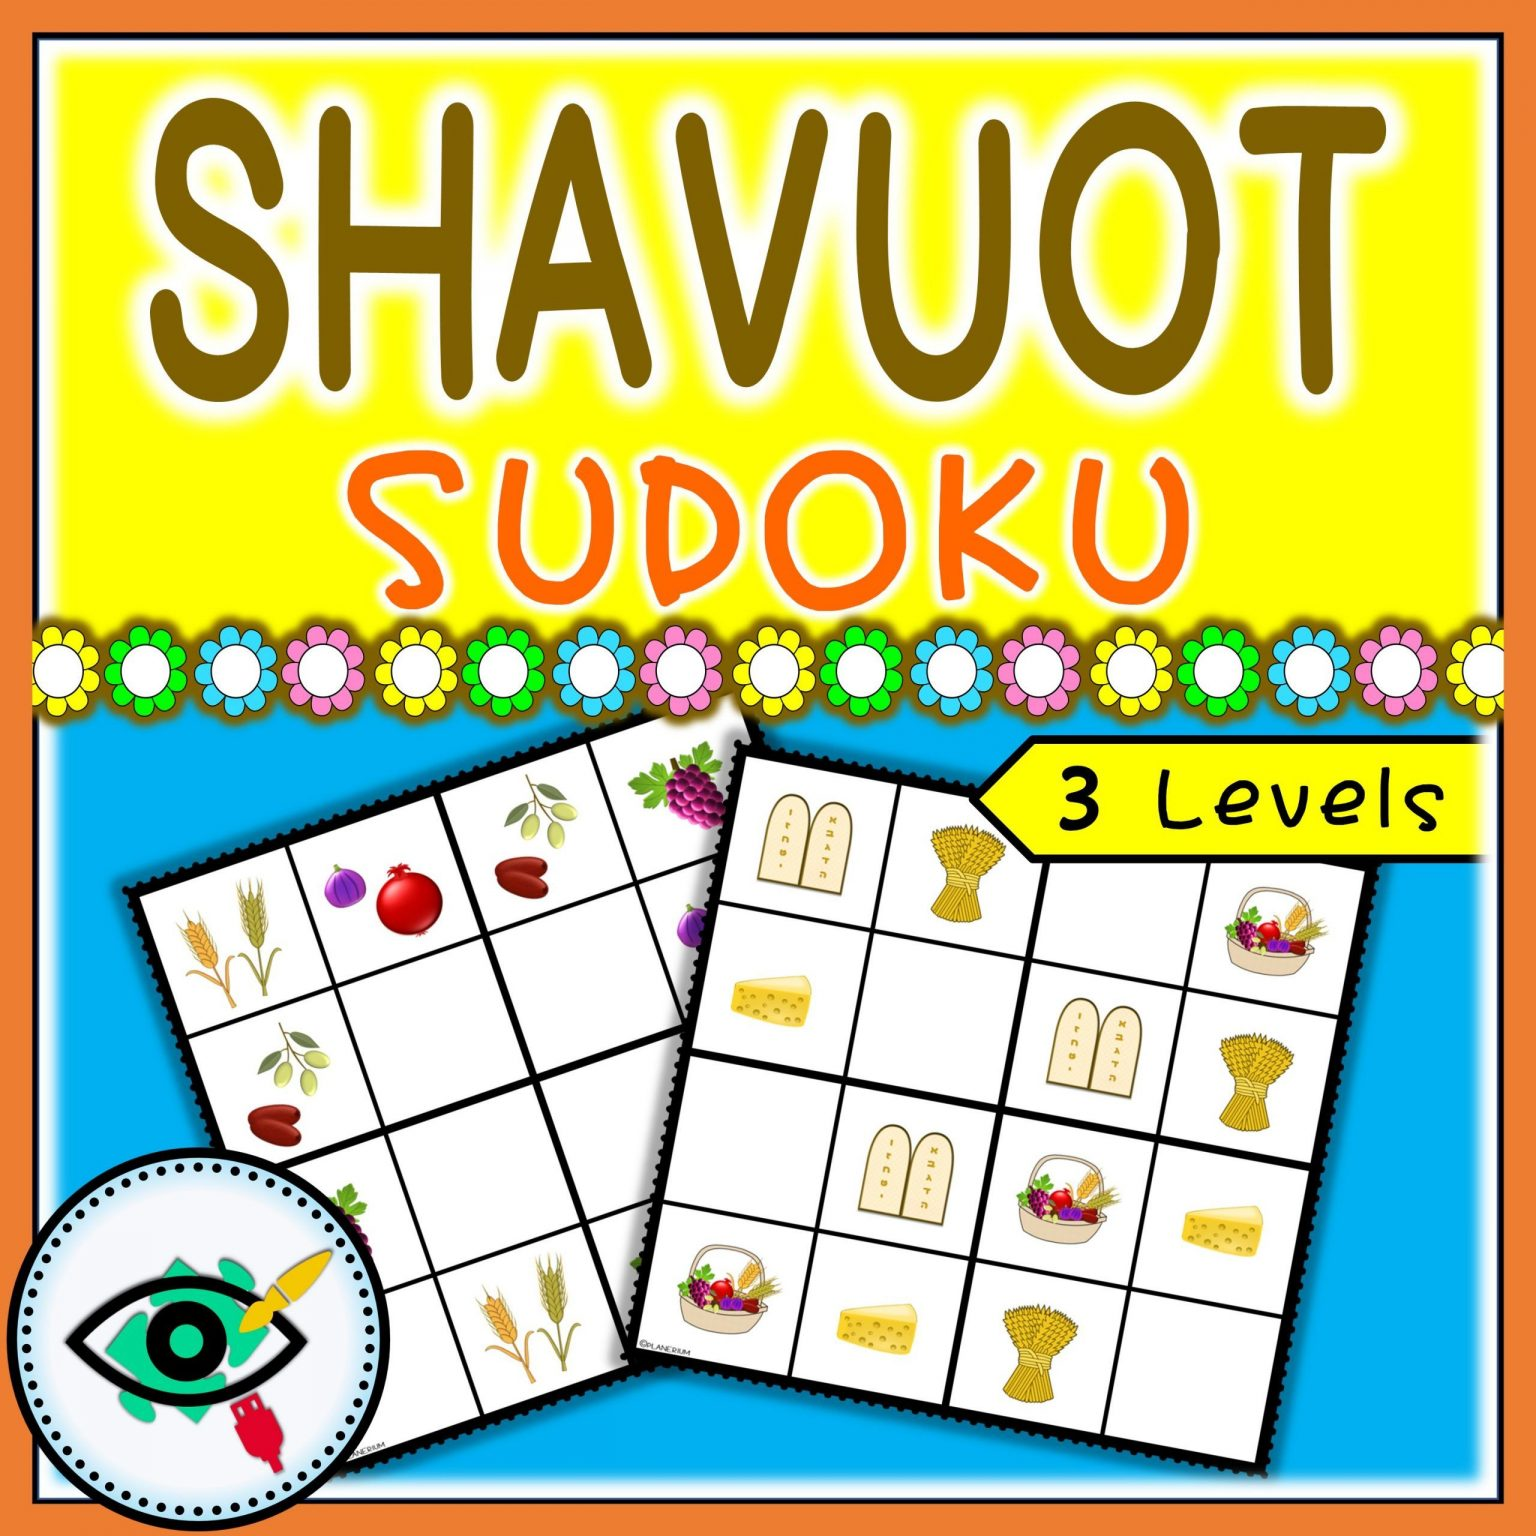 Shavuot - Sudoku Puzzle Game   Planerium